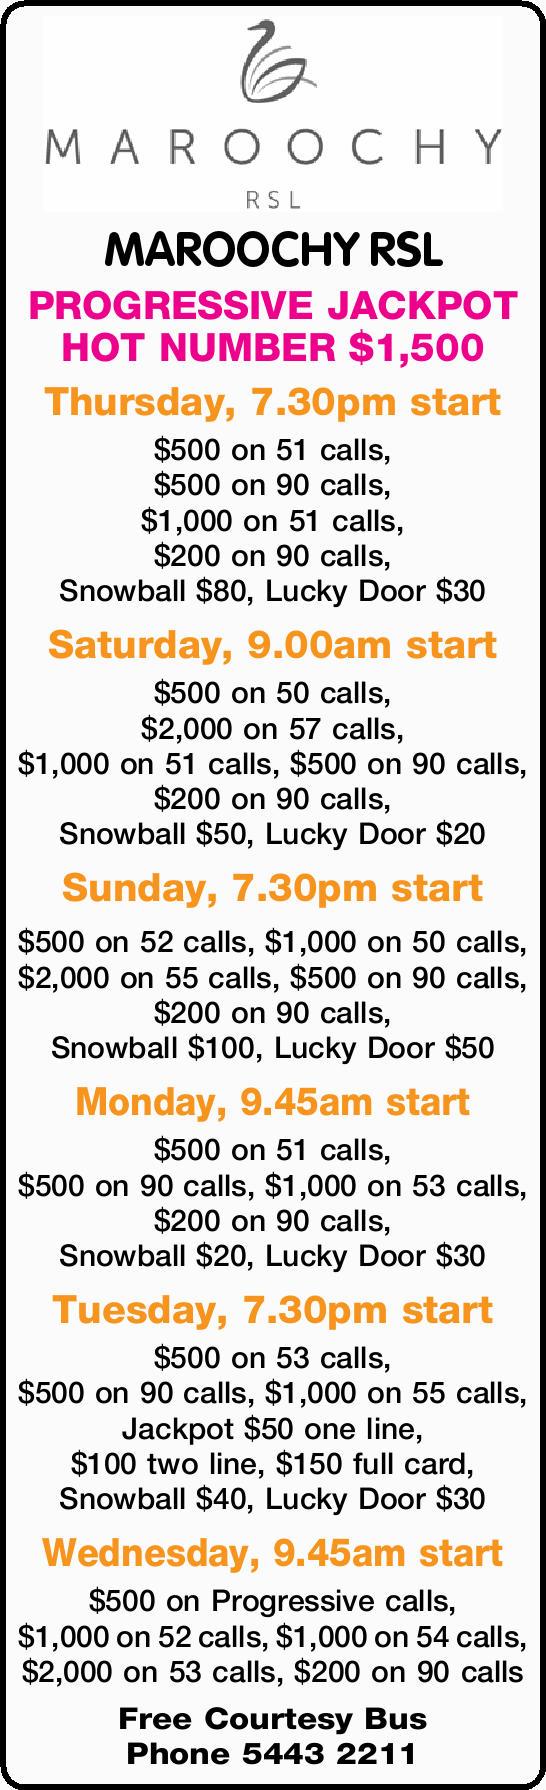 MAROOCHY RSL PROGRESSIVE JACKPOT HOT NUMBER $1,500 Thursday, 7.30pm start $500 on 51 calls, $500...